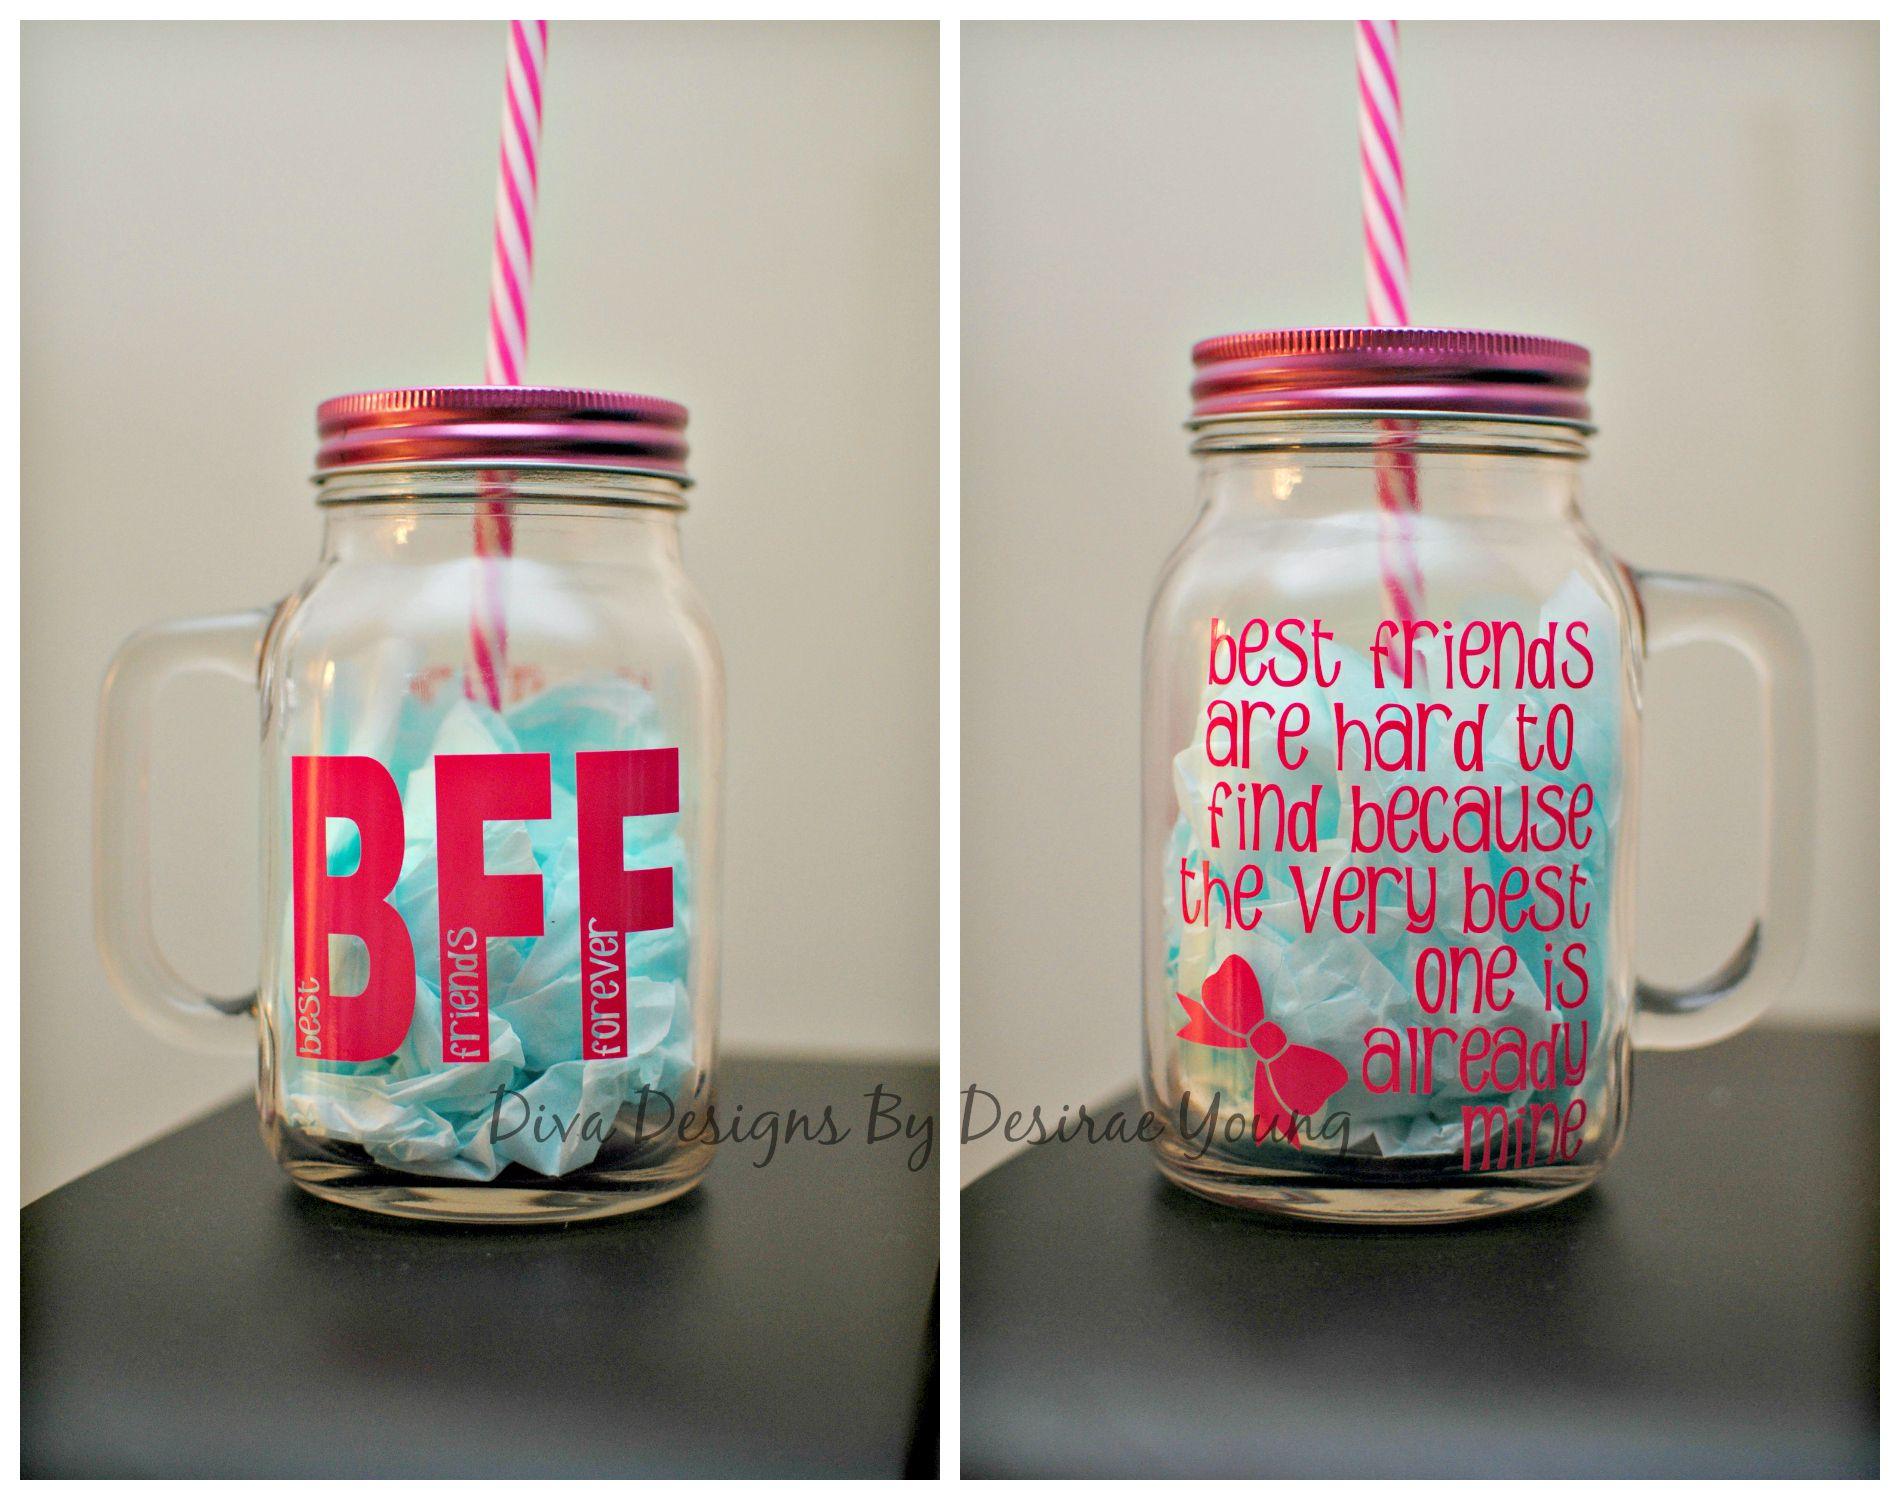 Custom Best Friend Mason Jars Birthday Gift Quote Gifts For Female Friends Presents For Boyfriend